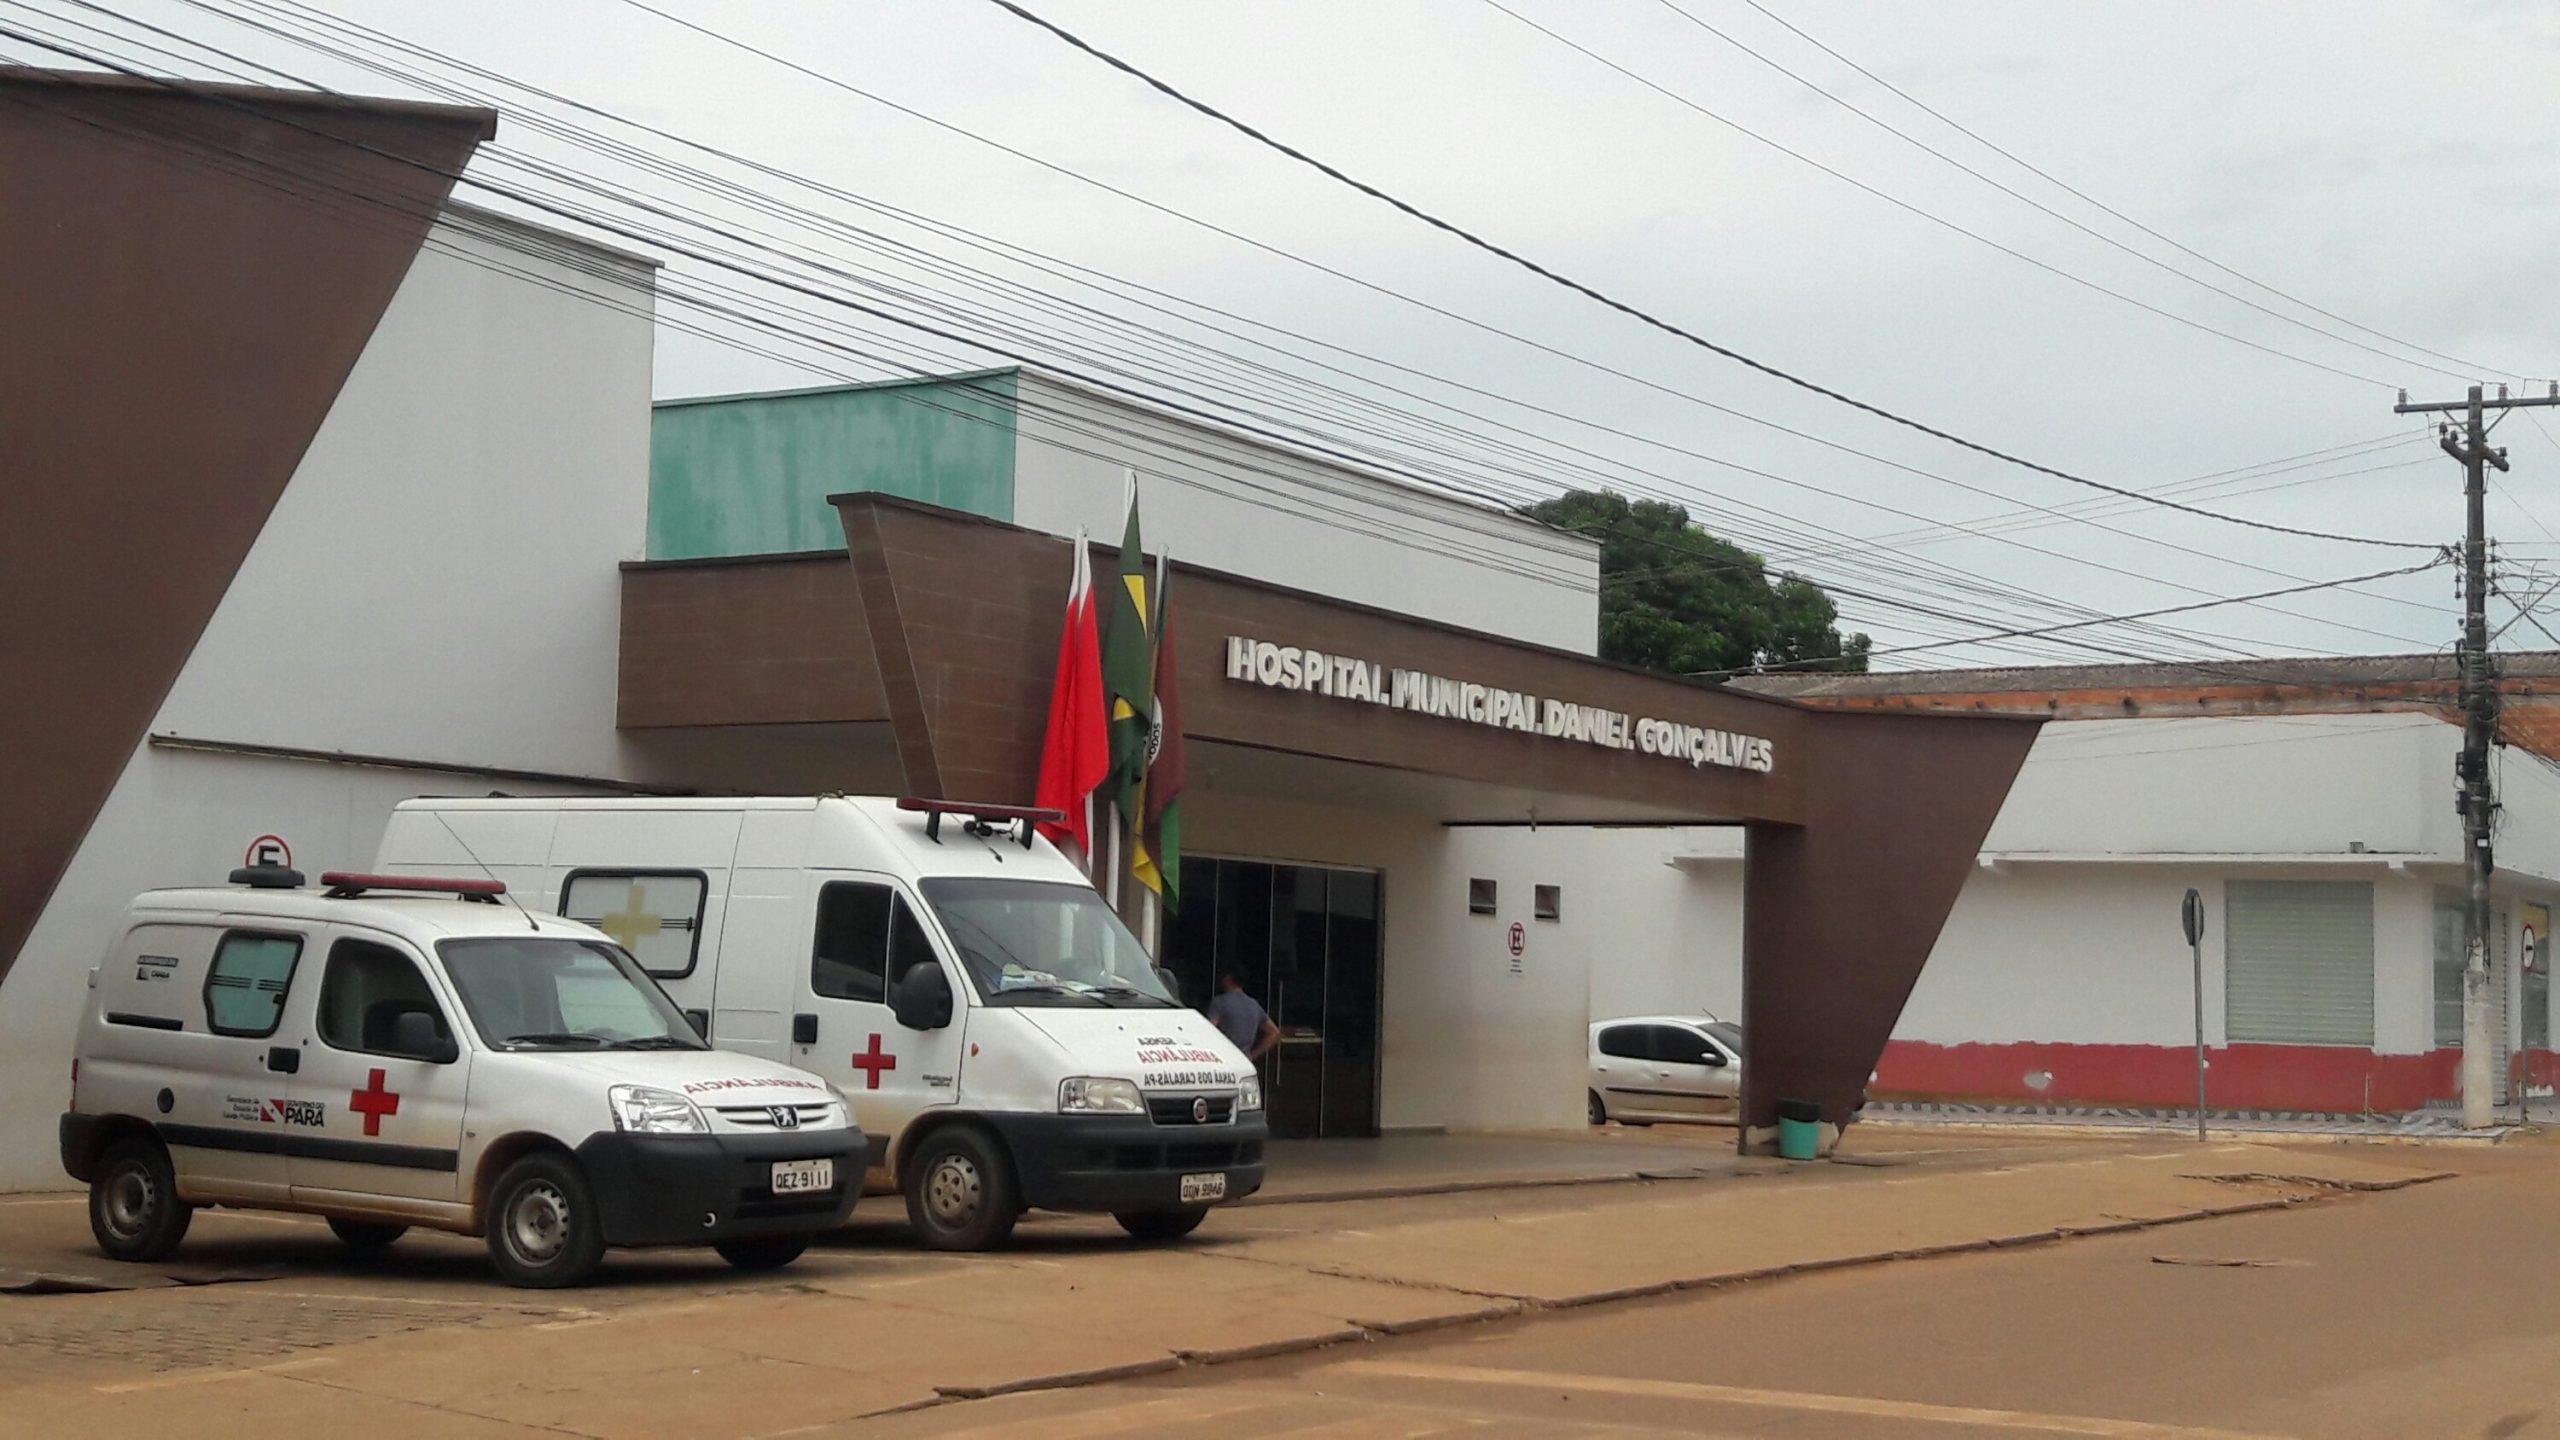 Hospital Municipal de Canaã dos Carajás / Foto: Jorge Clésio